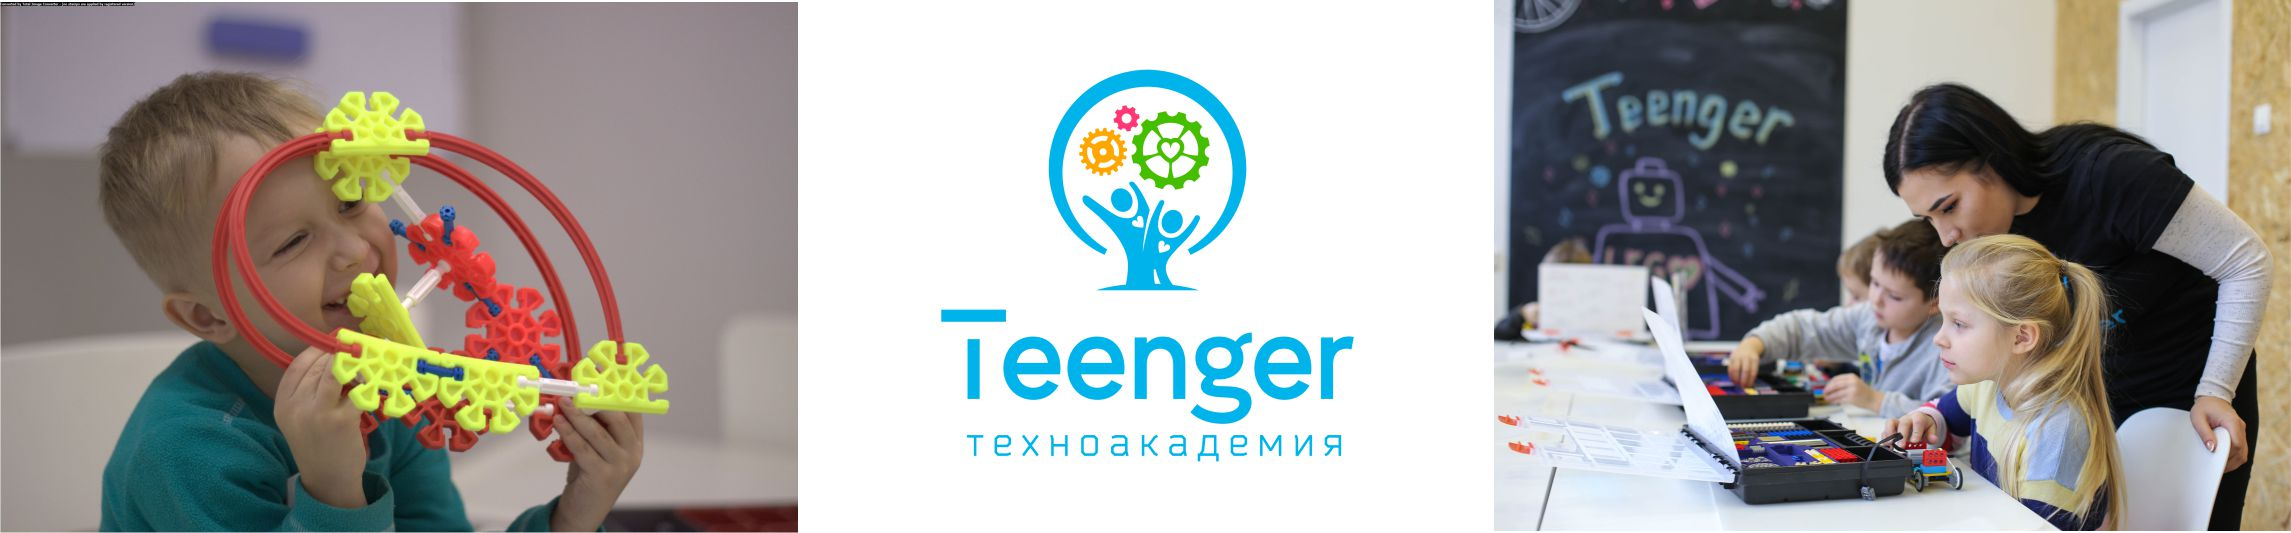 Техноакадемия TEENGER в ТК ЭКОПОЛИС premium